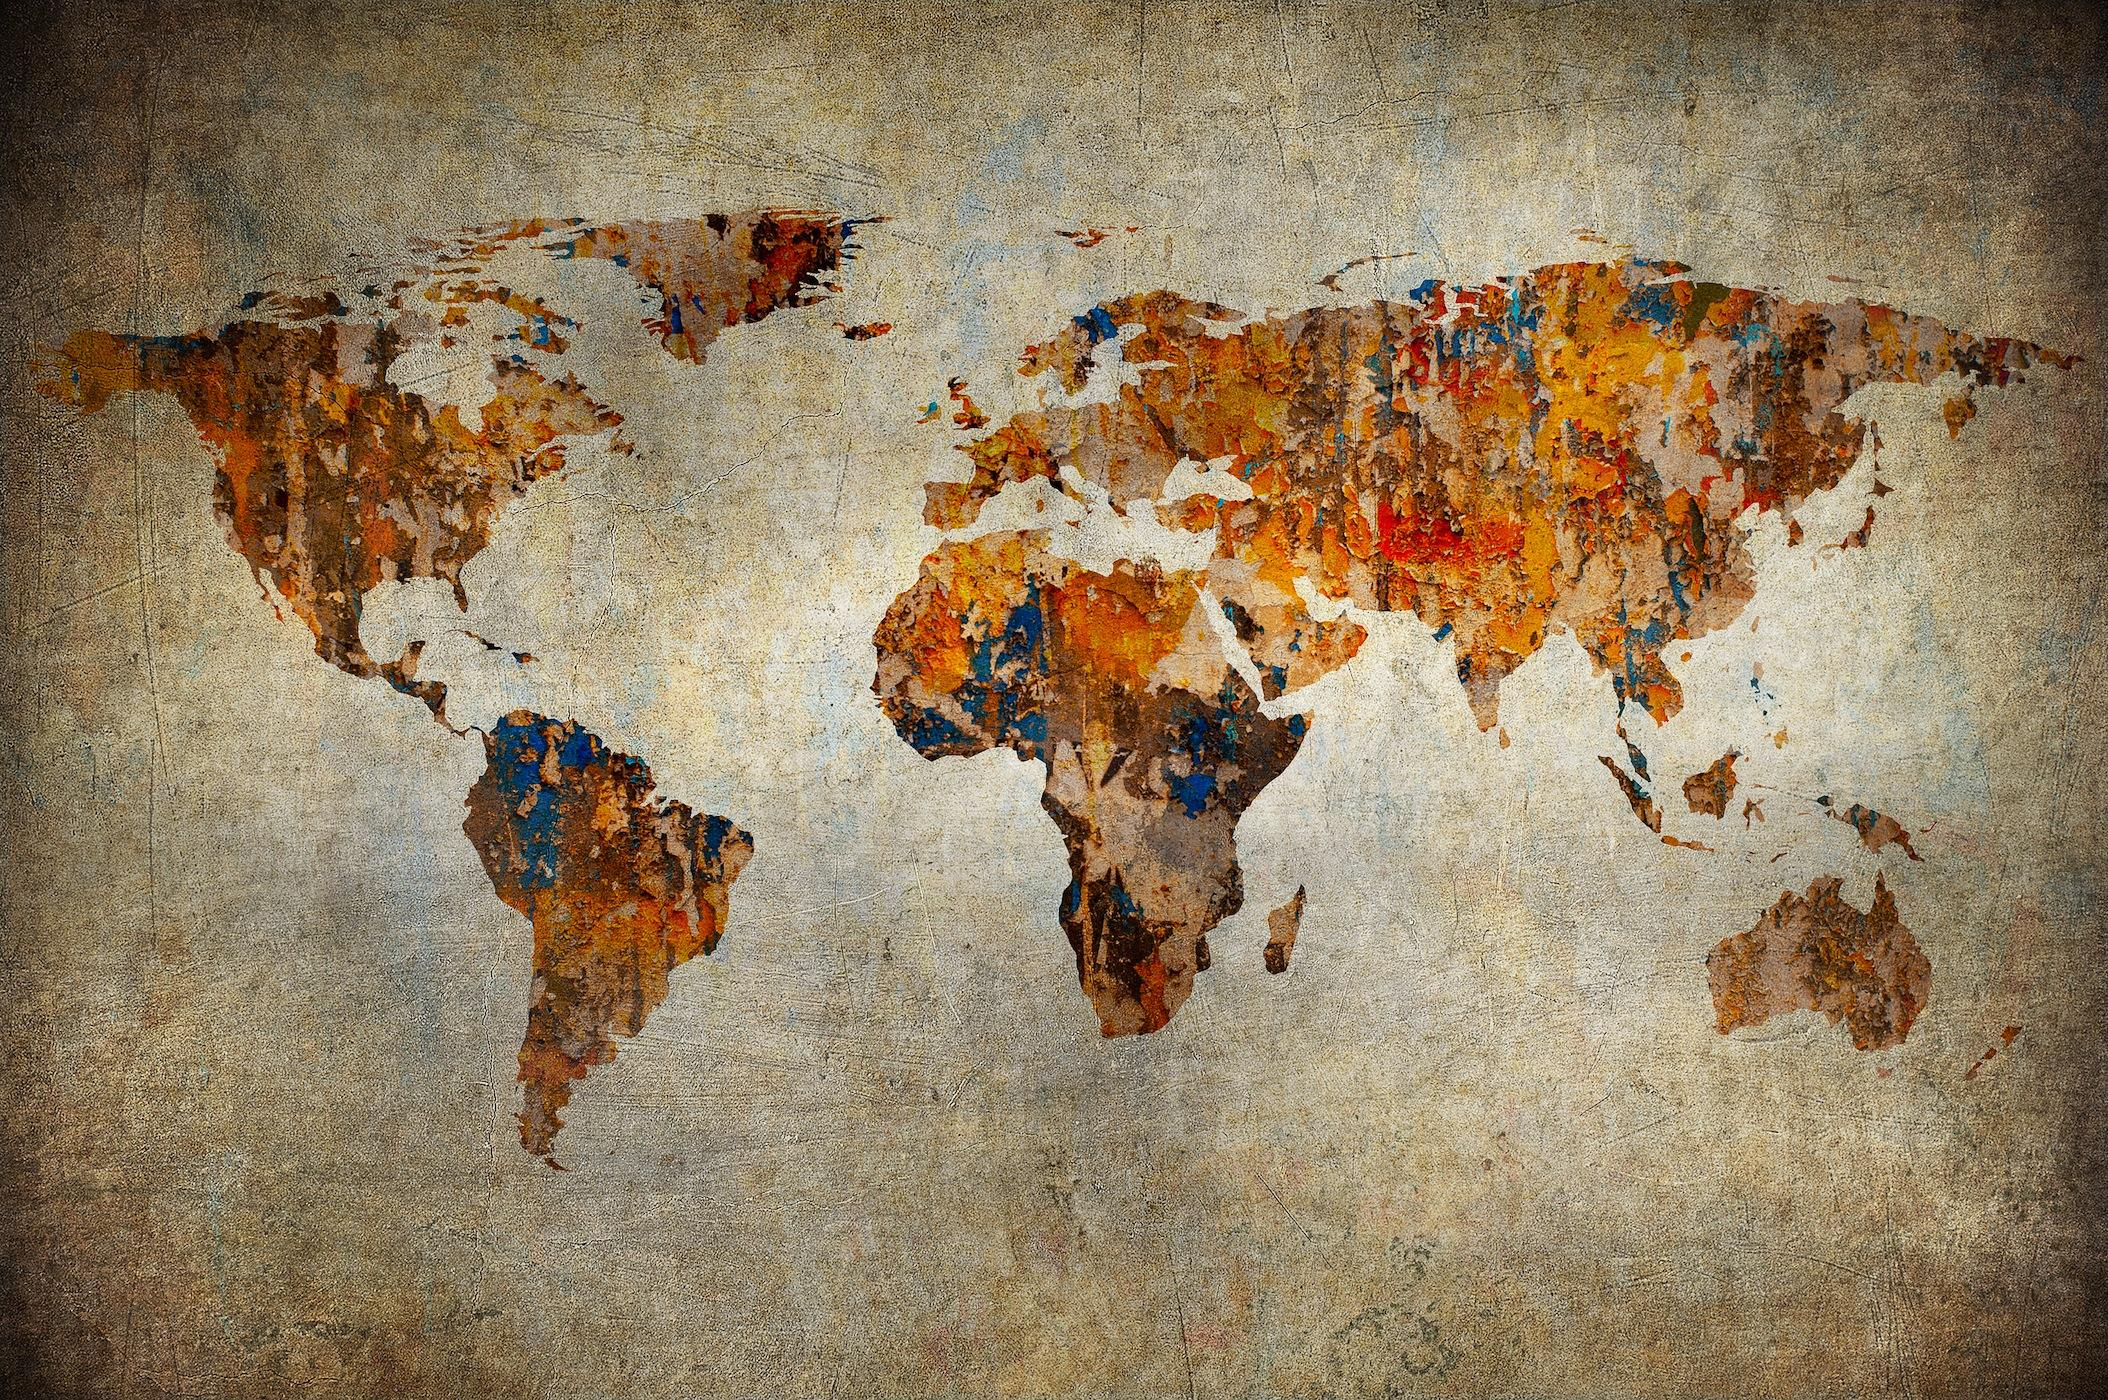 harita resimli duvar kagidi